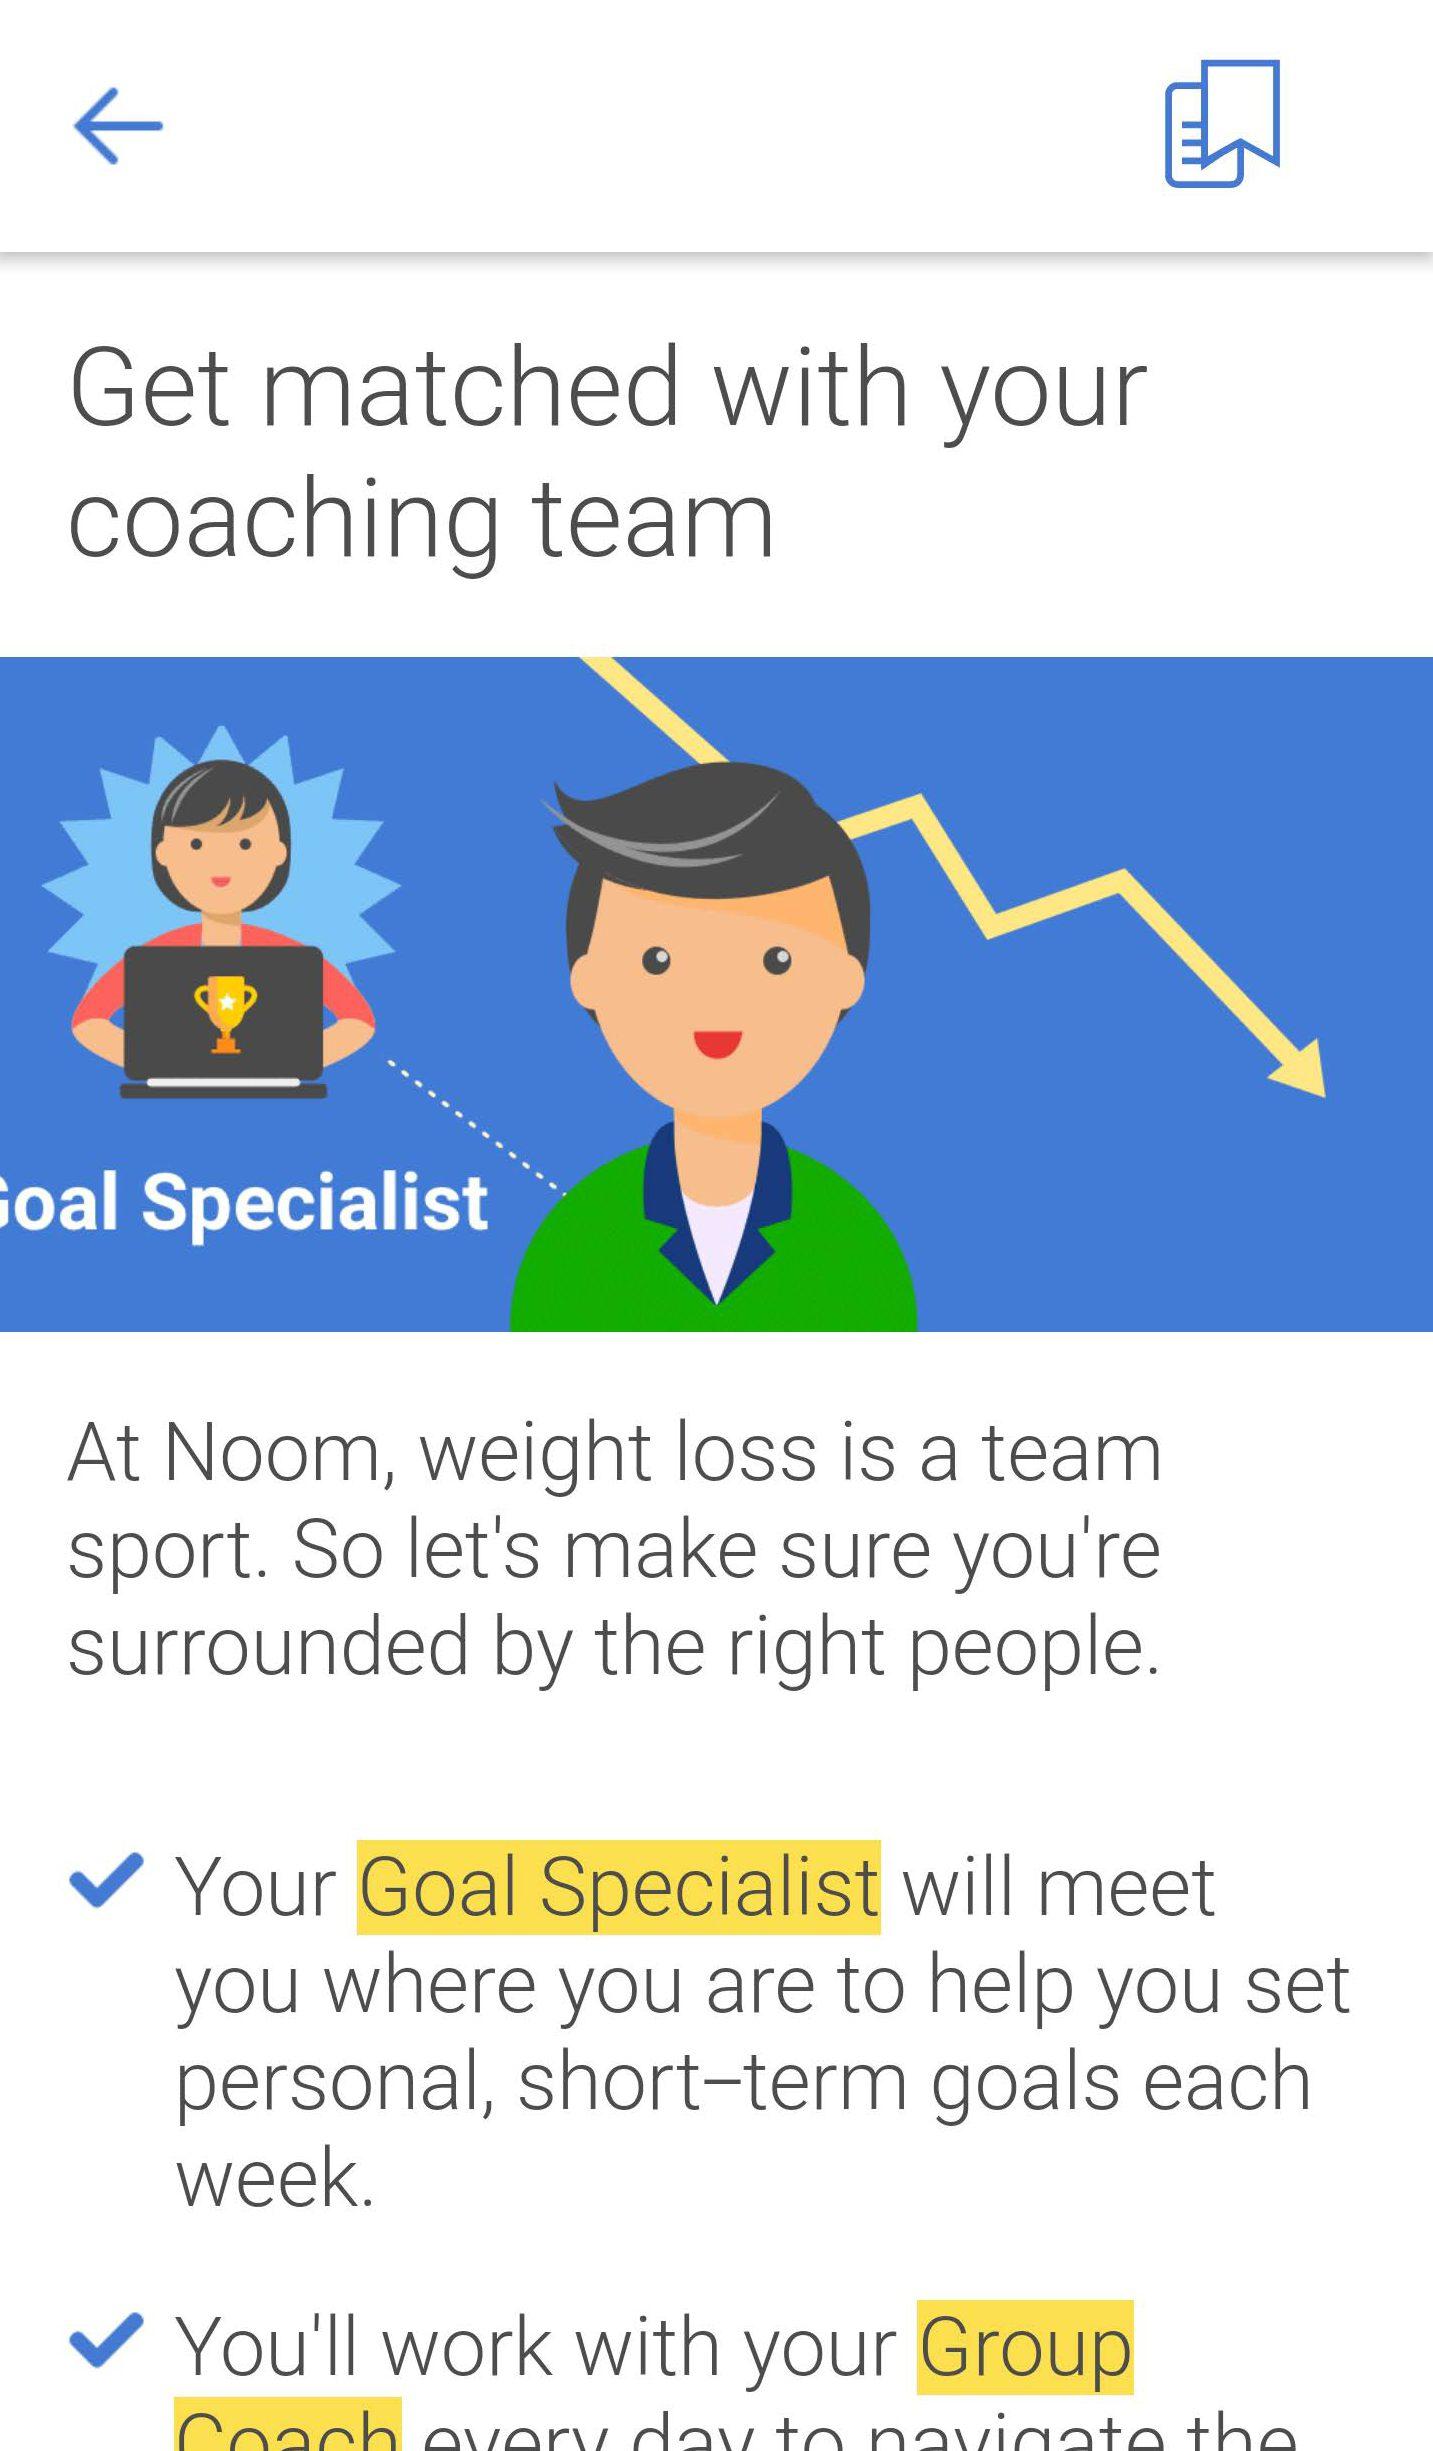 Noom goal specialist